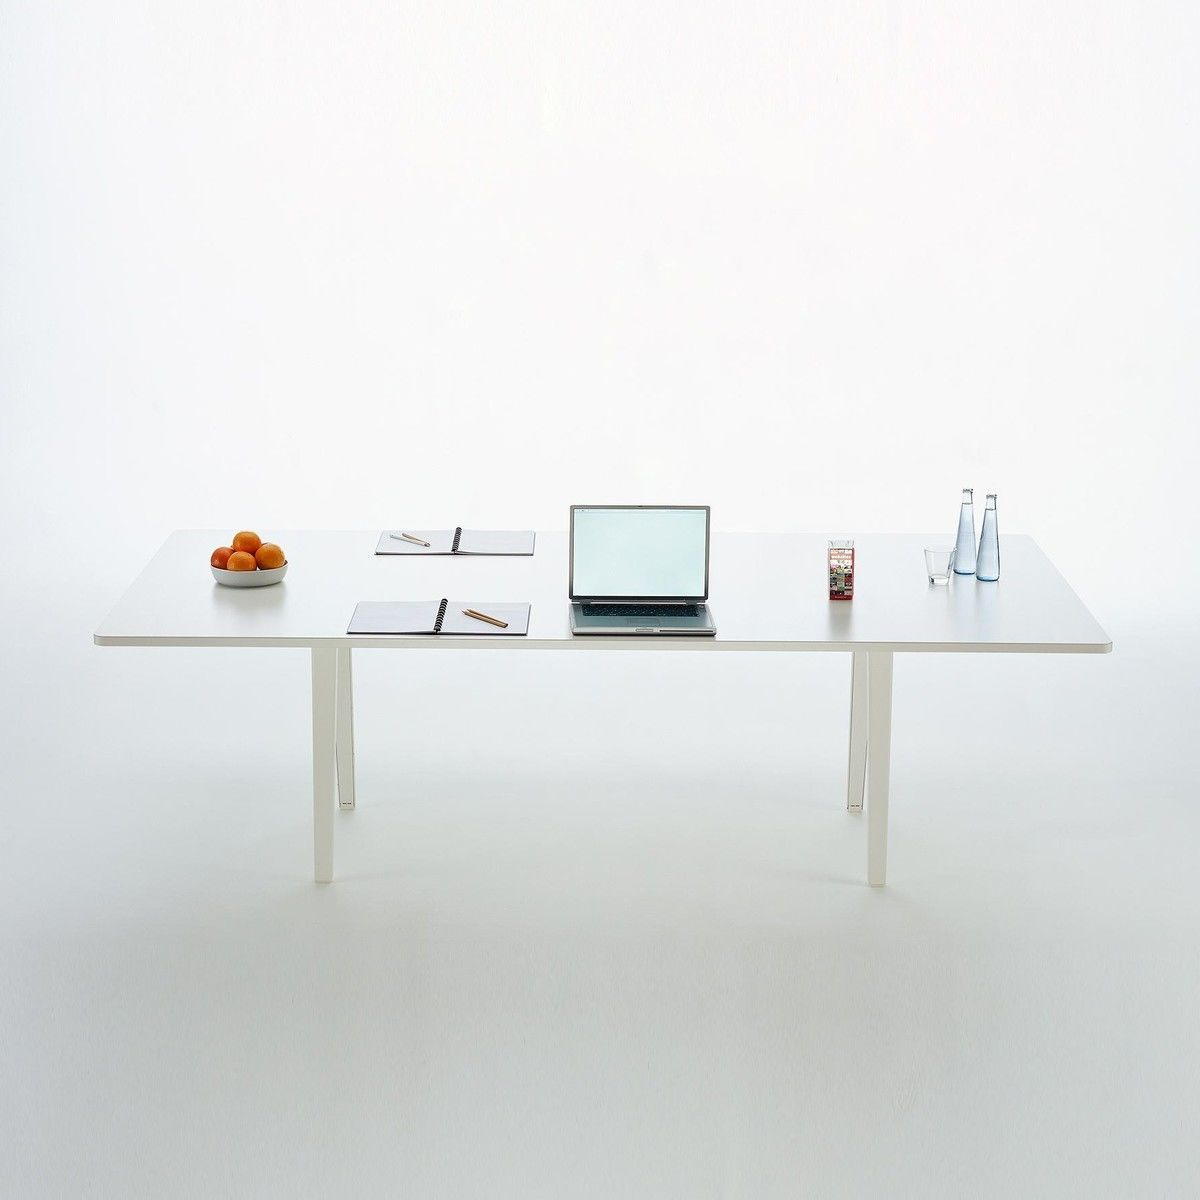 Joyn Single Bench Table Vitra AmbienteDirectcom